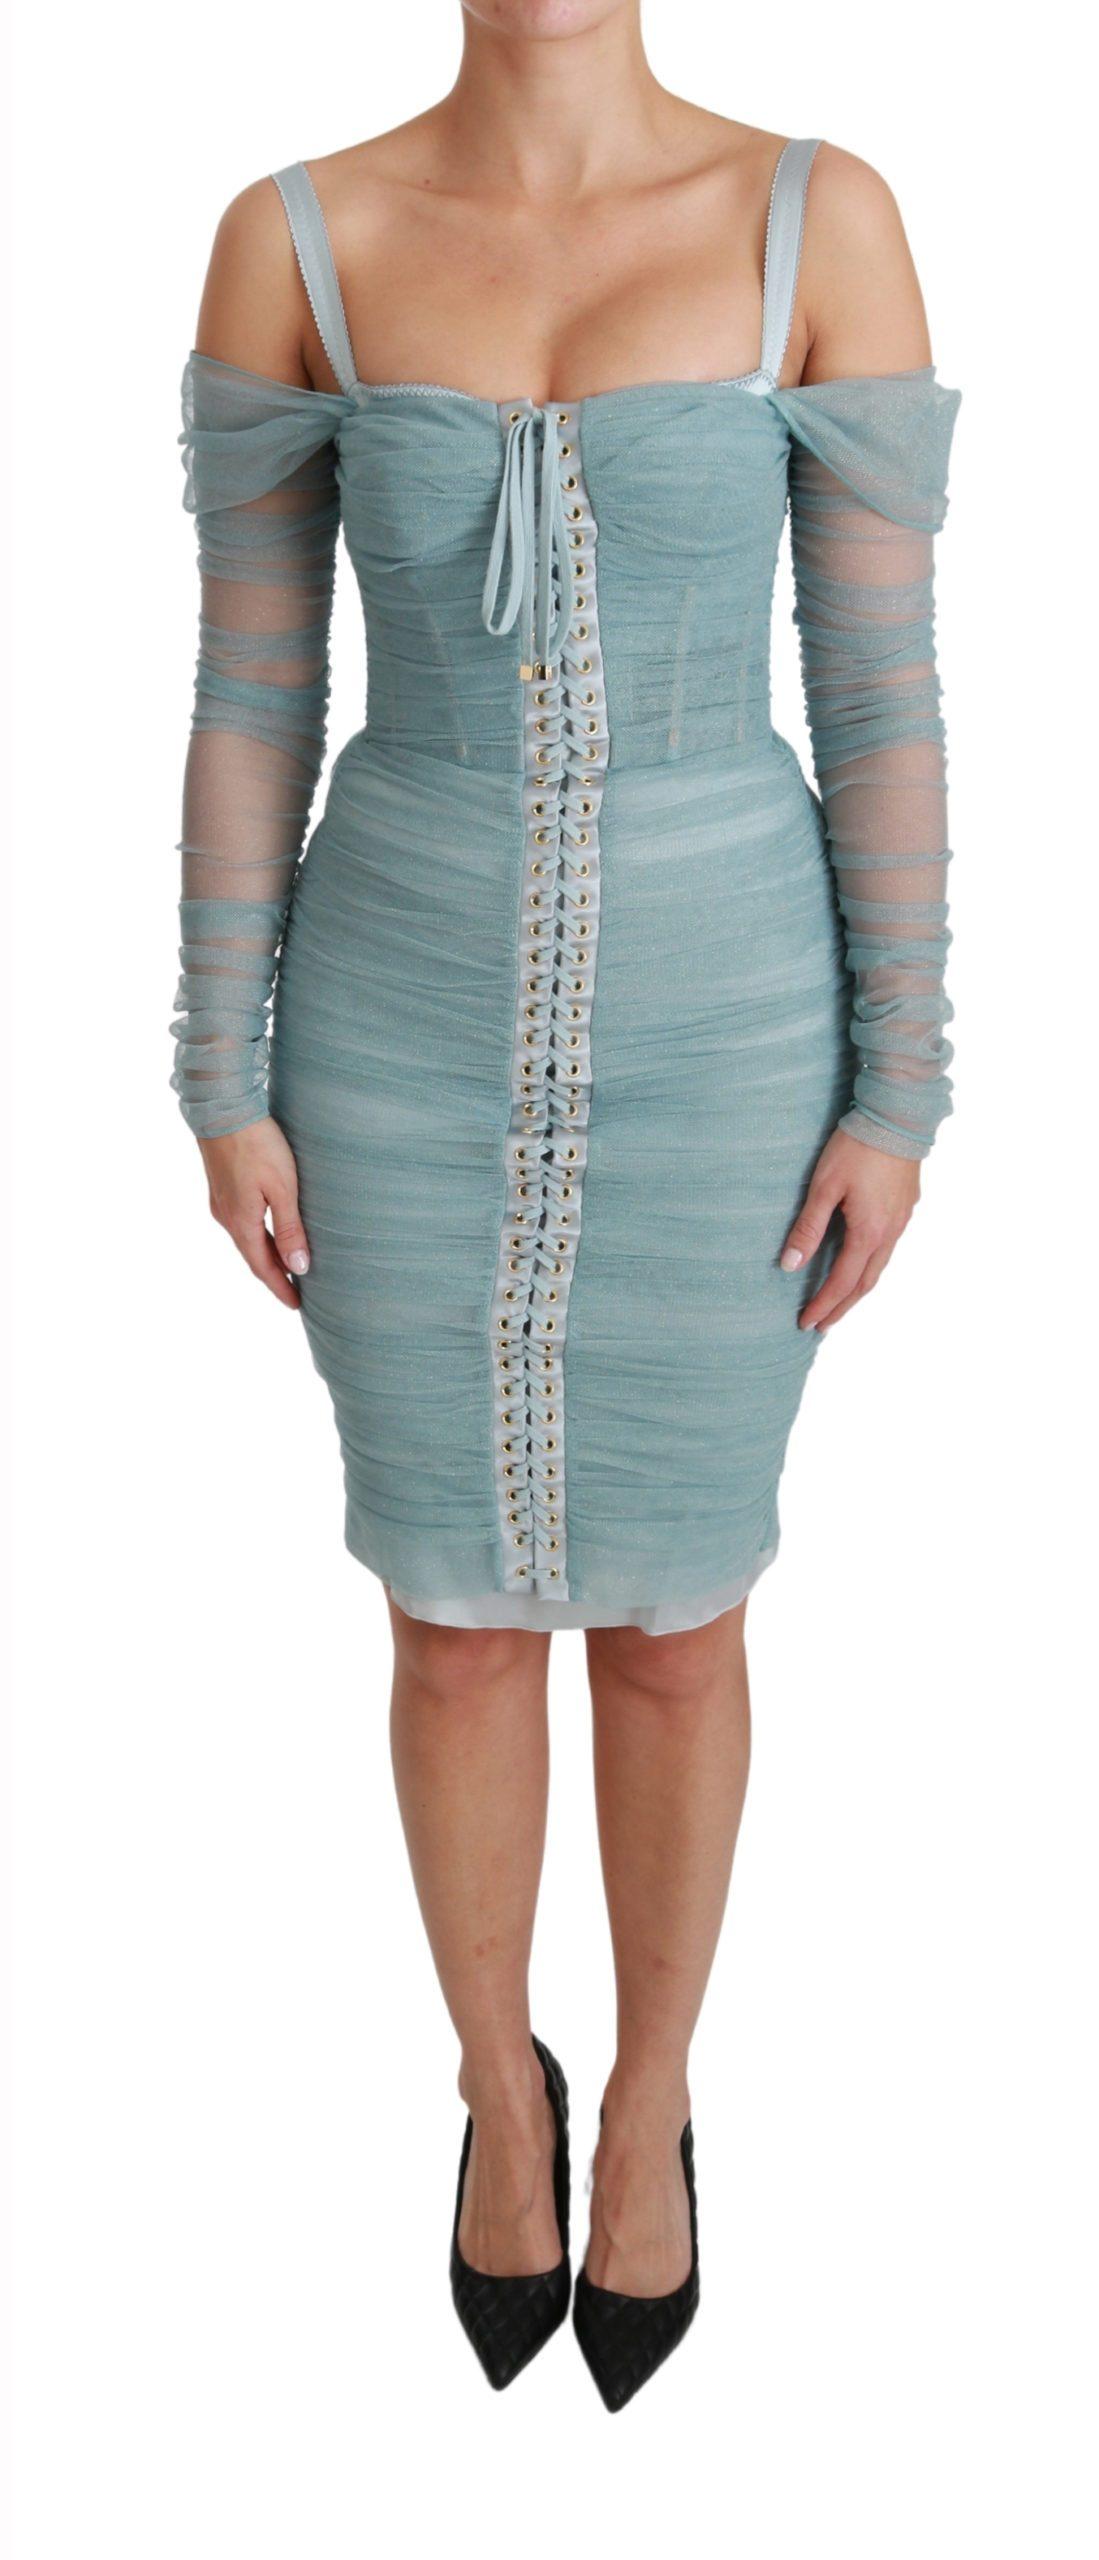 Dolce & Gabbana Women's LS Stretch Dress Blue DR2491 - IT42|M